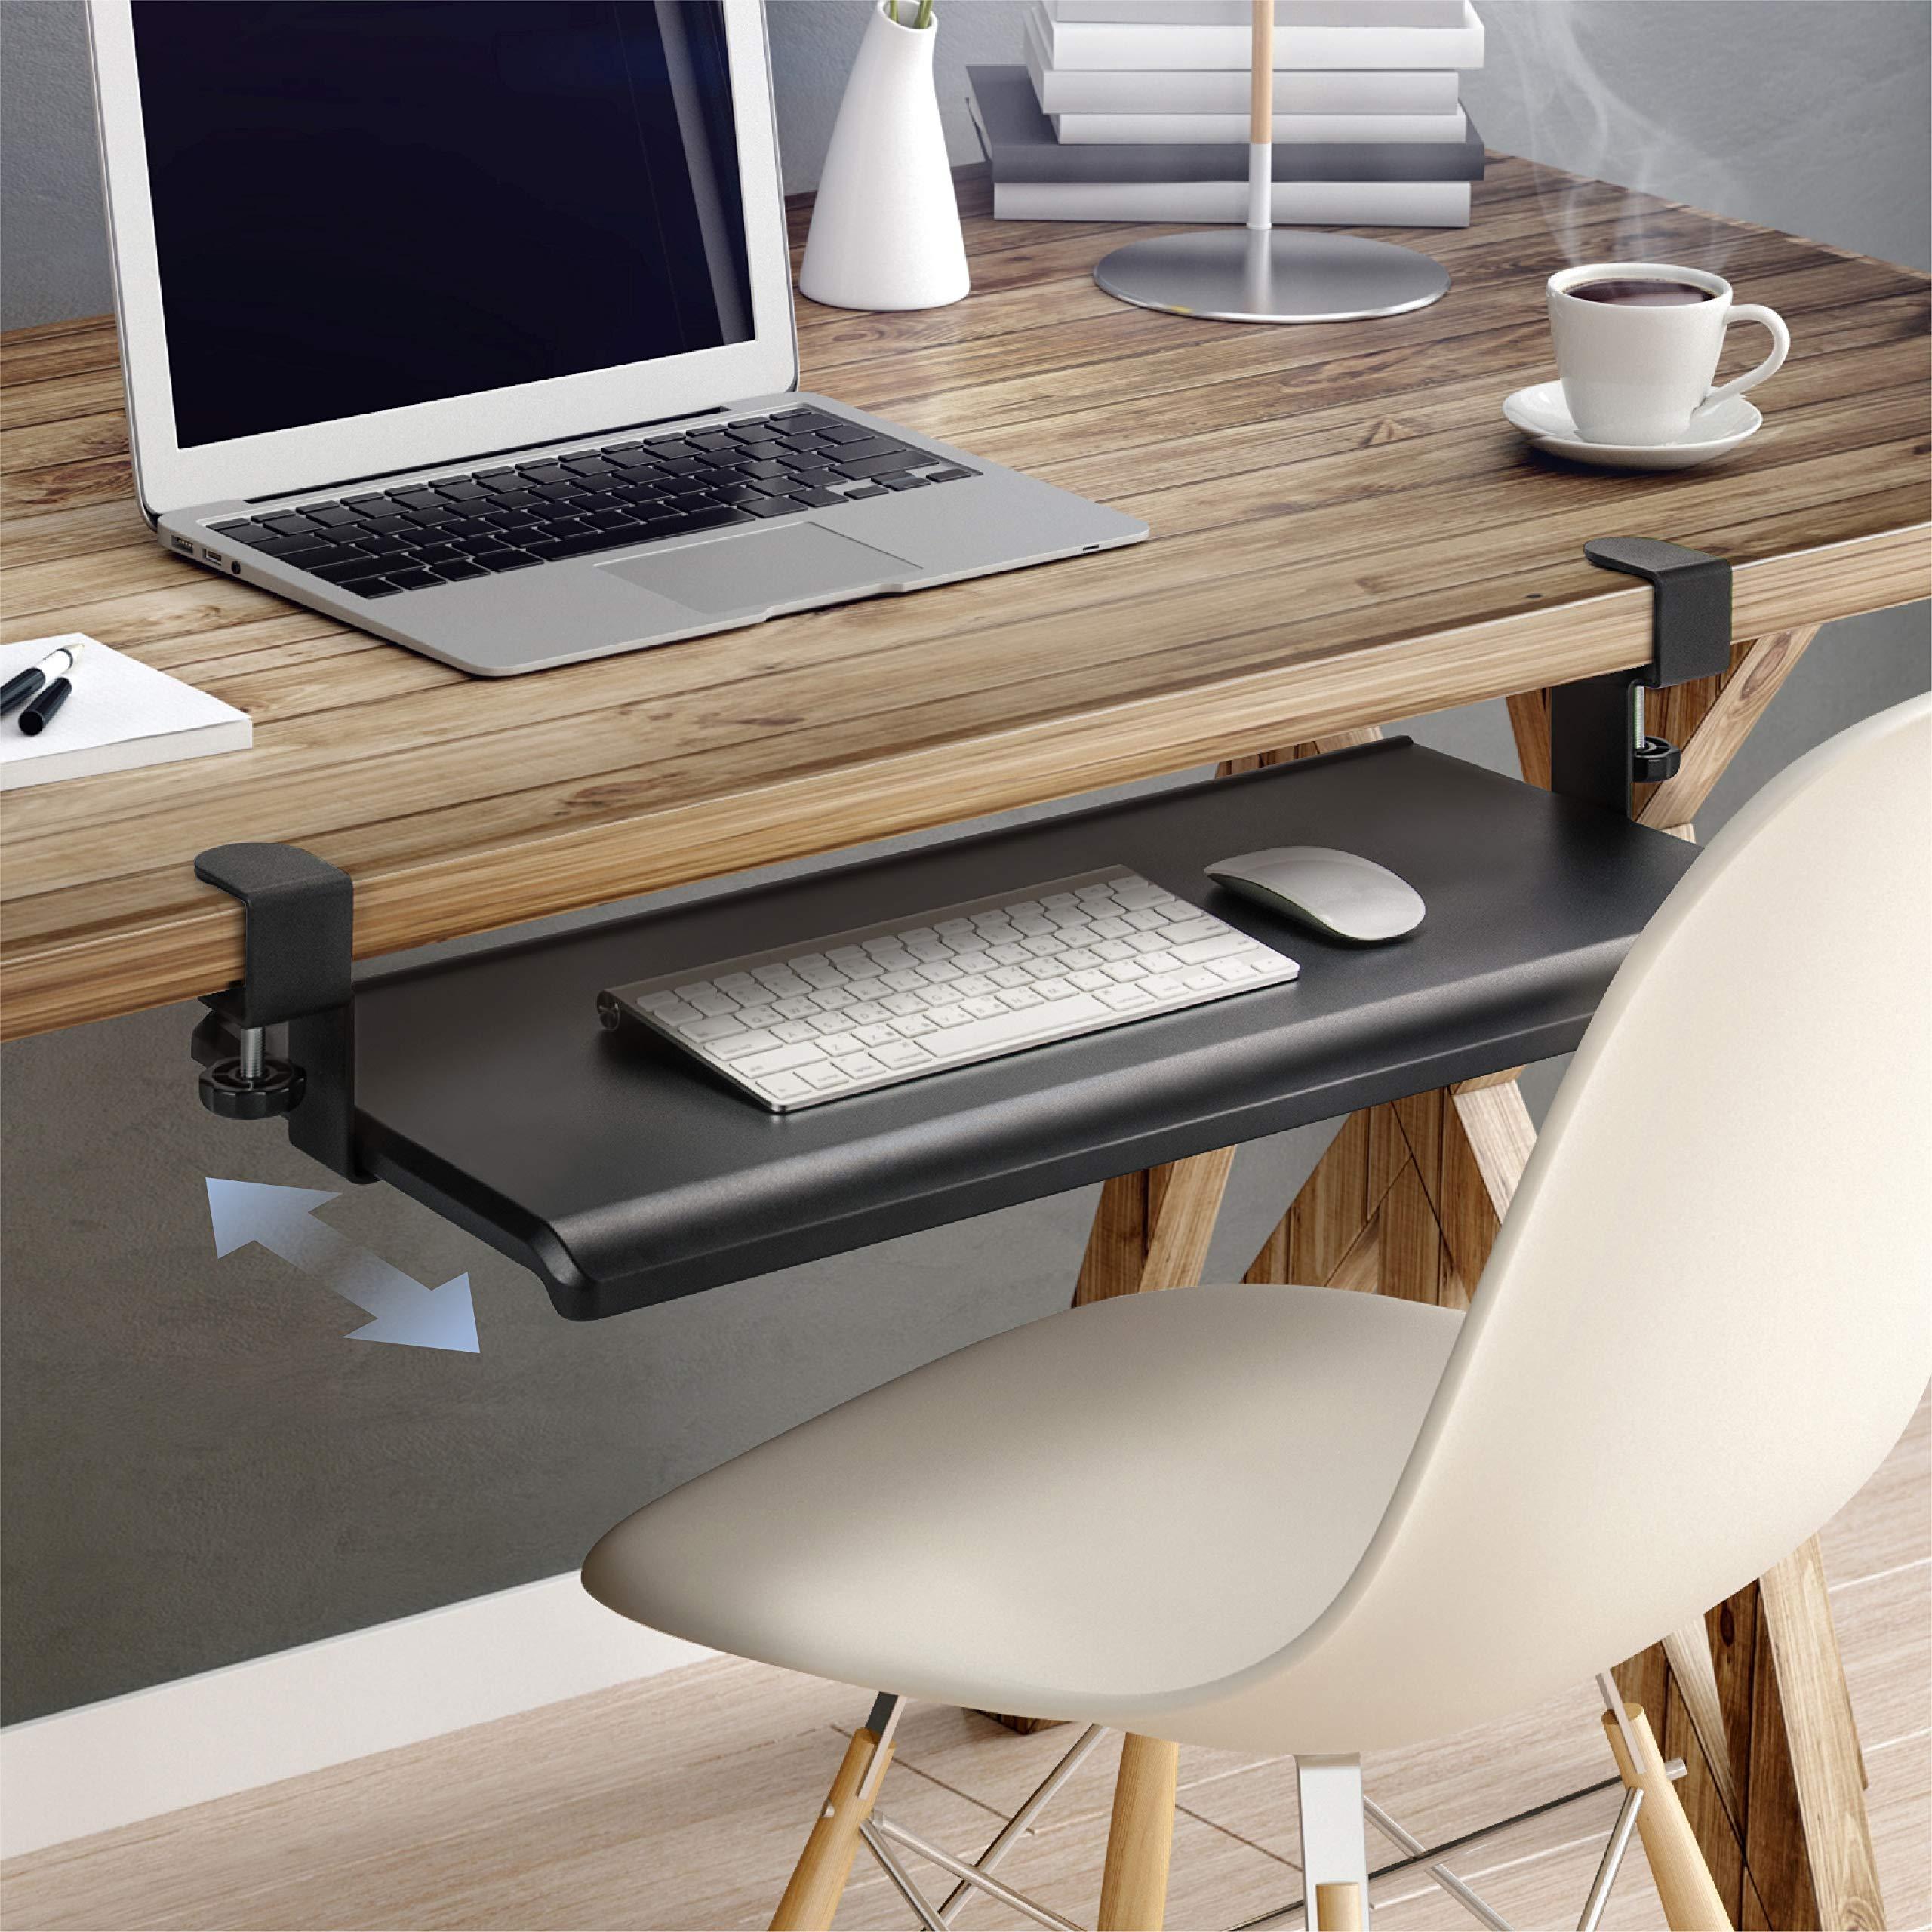 EHO Prime Desk Clamp Keyboard Tray Keyboard Drawer